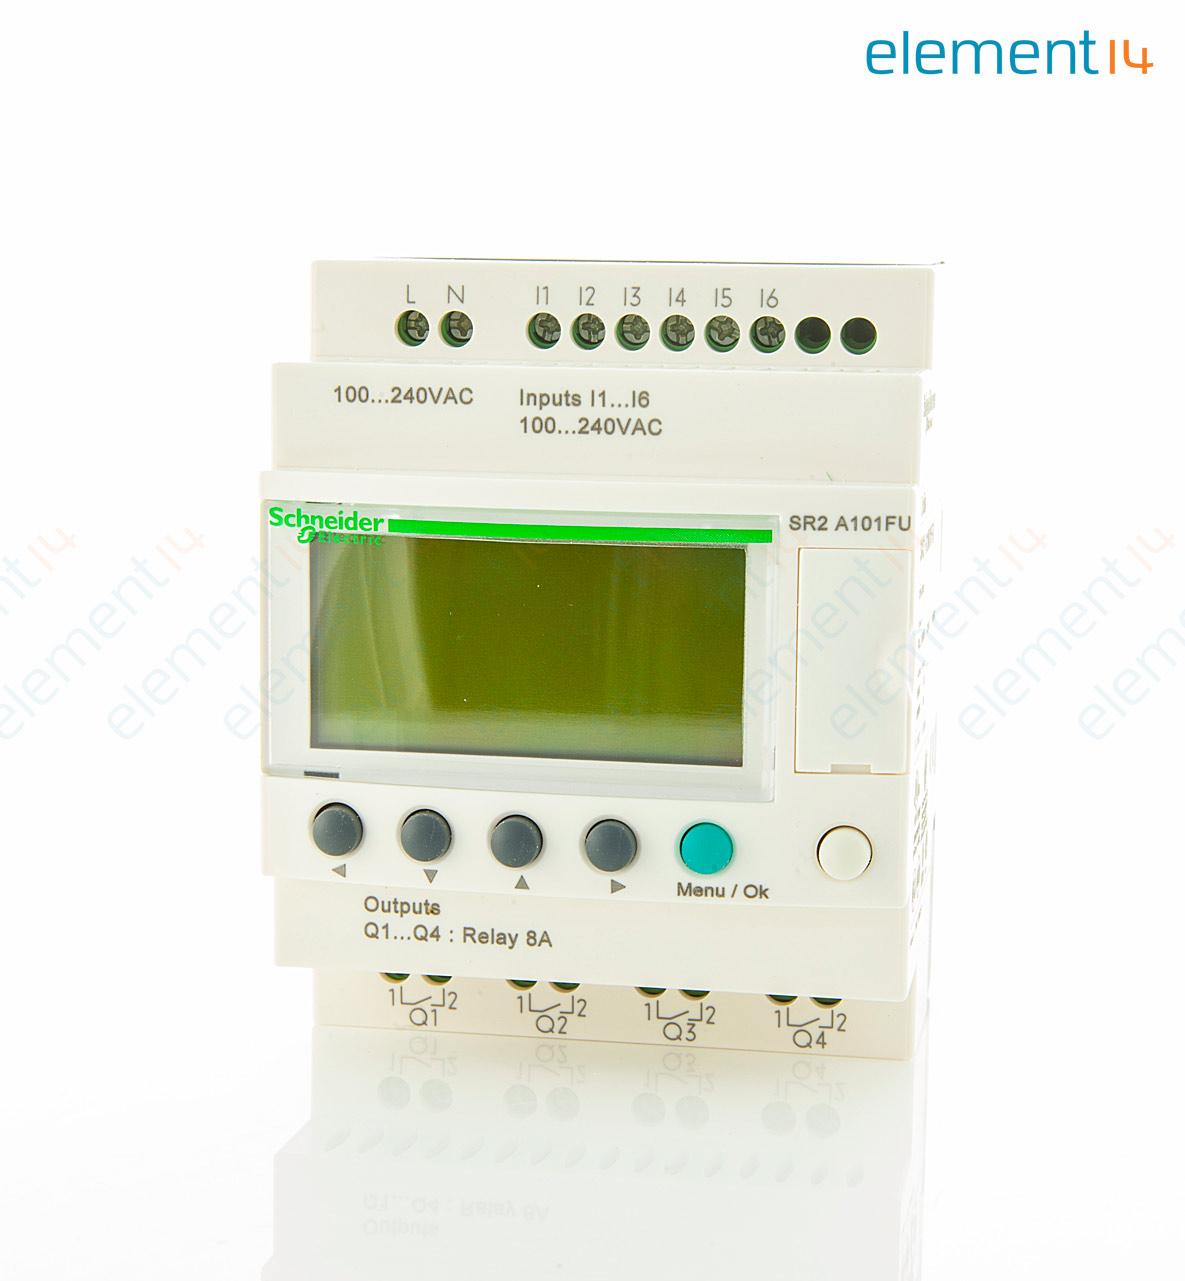 Sr2a101fu Schneider Electric Smart Relay Zelio Logic Series 6 Plc Wiring Diagram Add To Compare